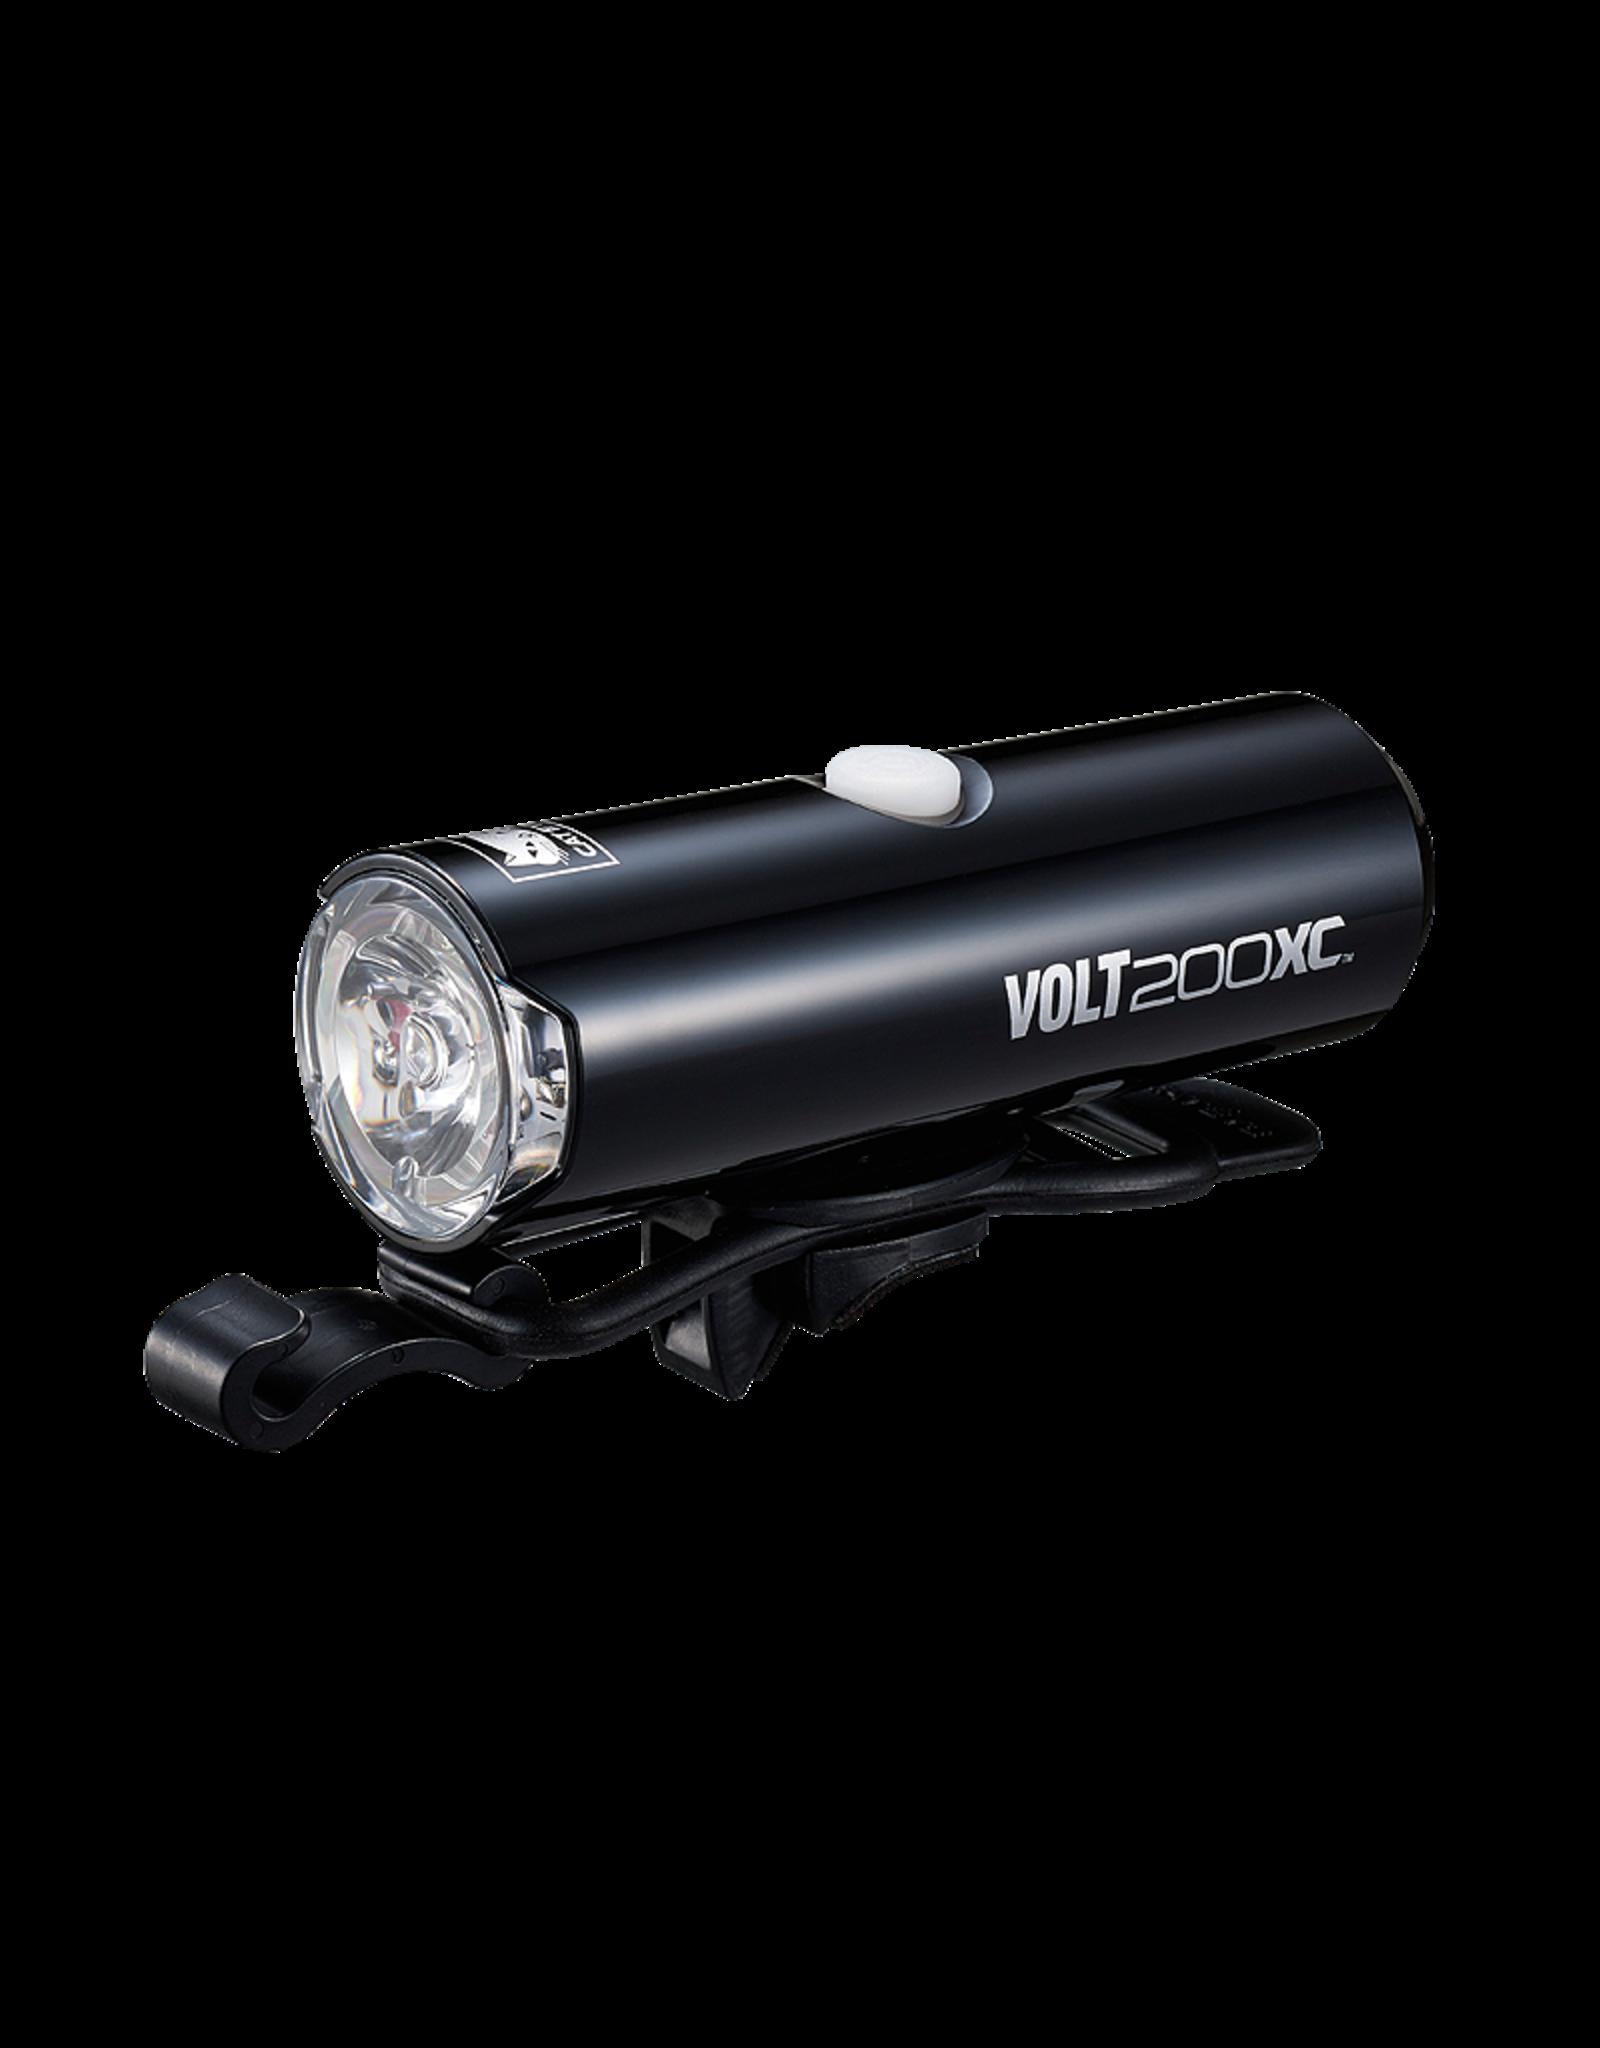 Volt 200 XC front light Cat Eye